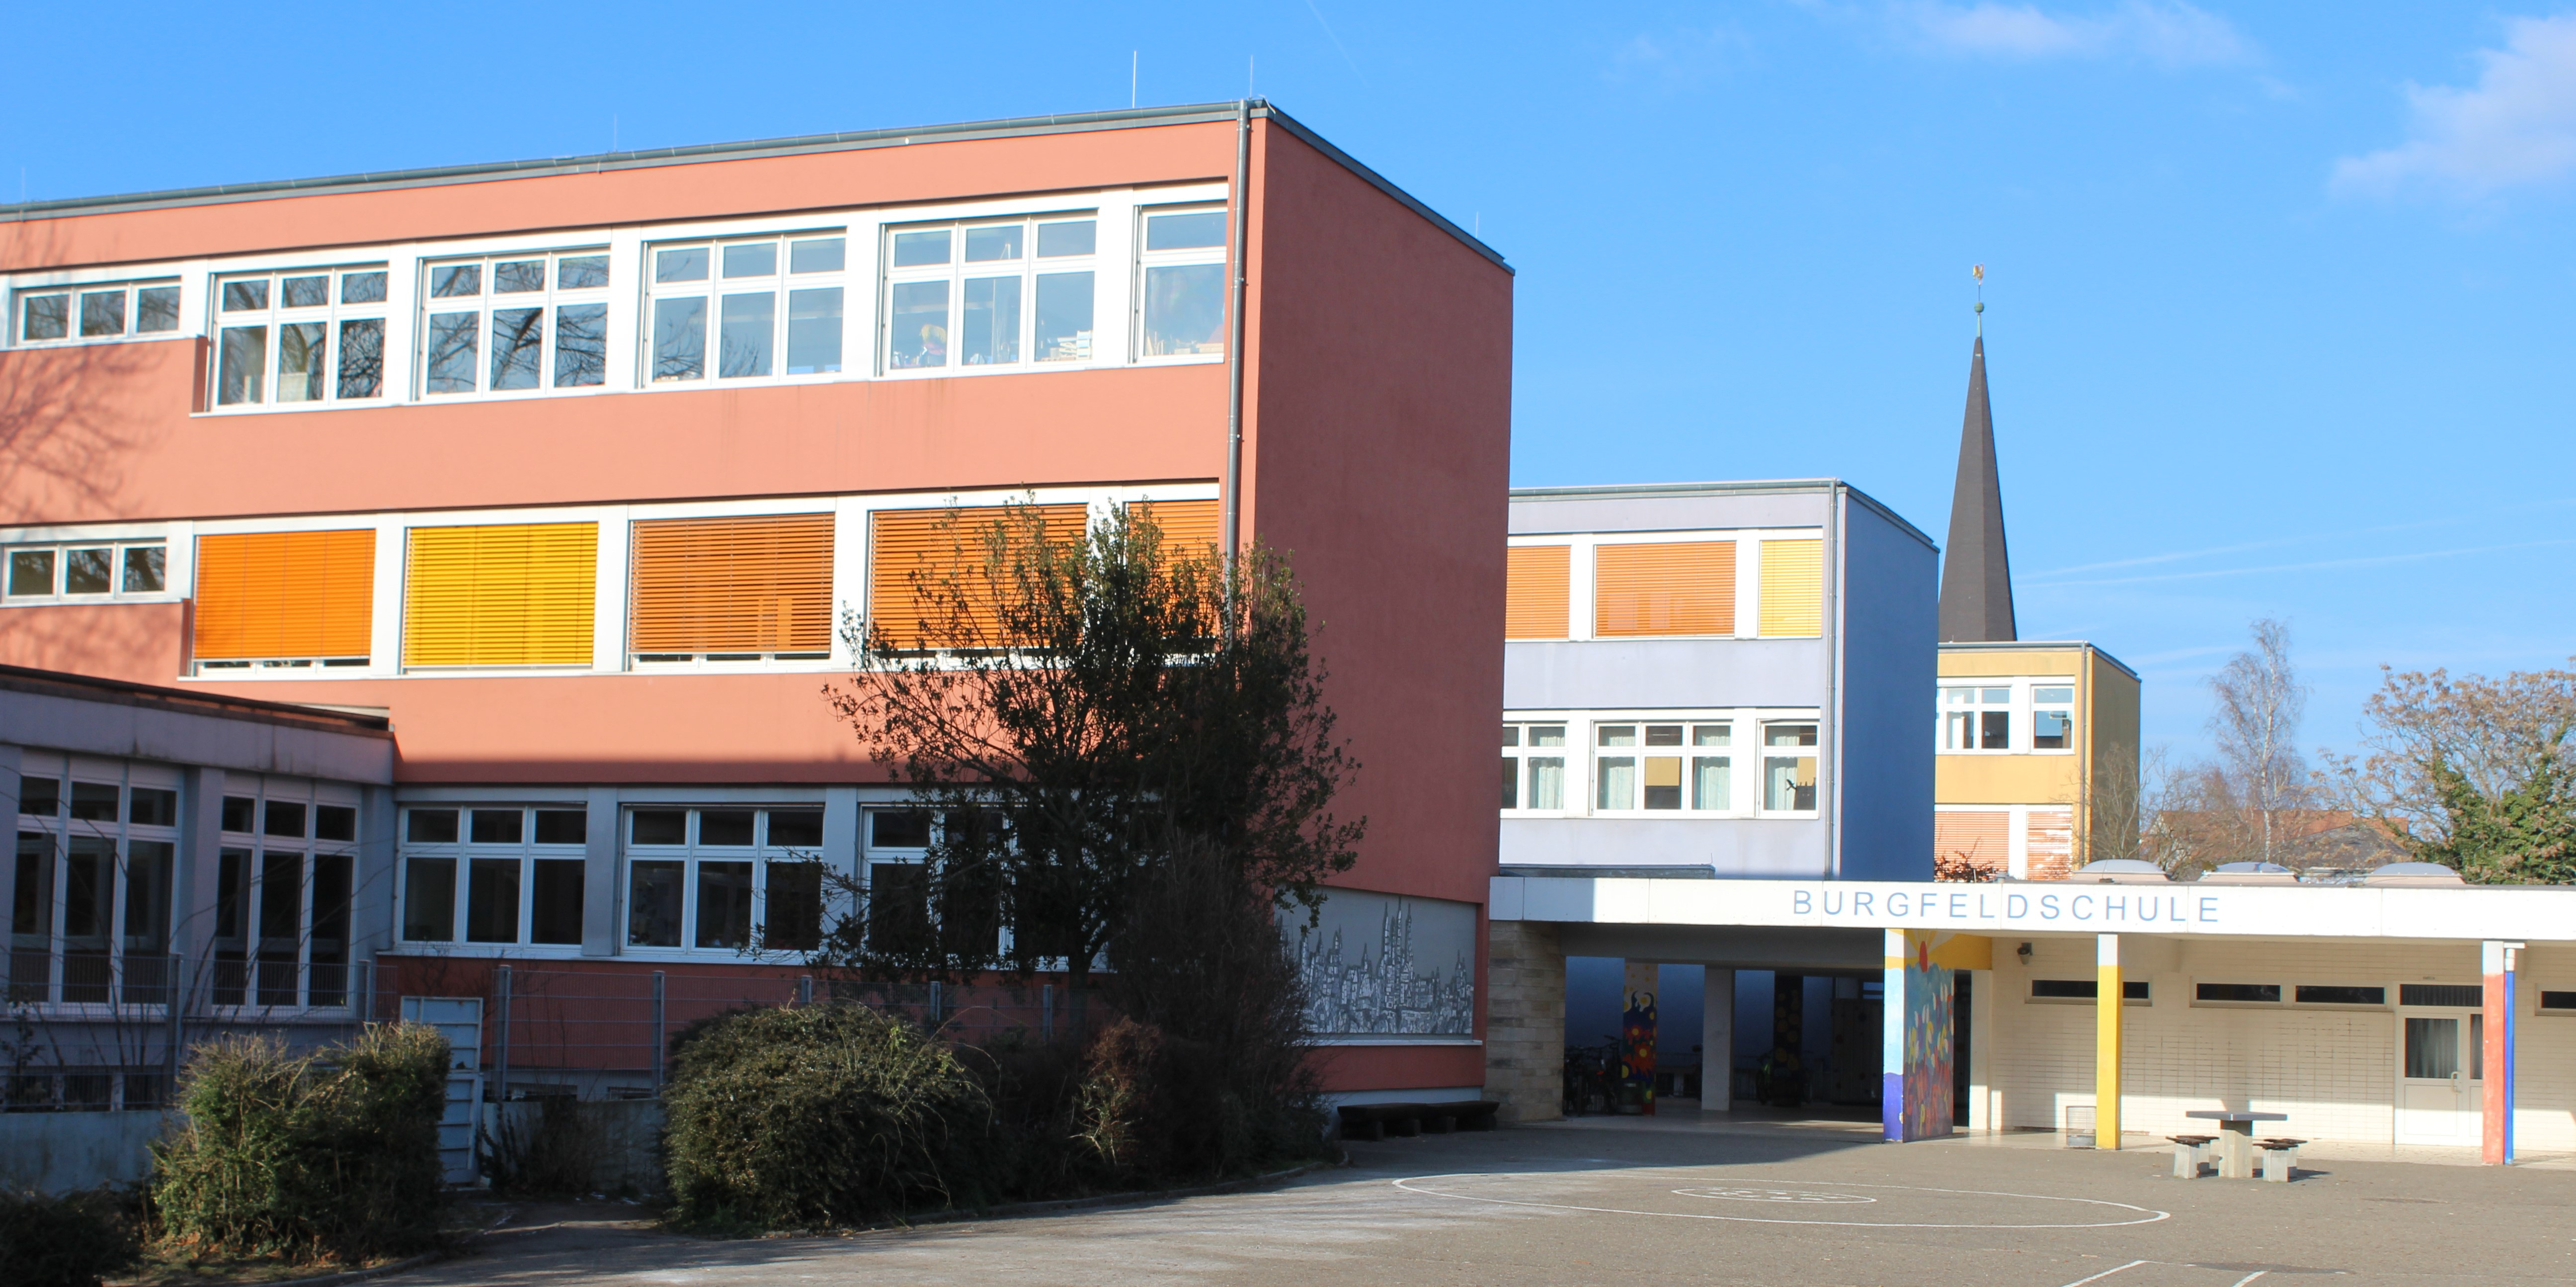 http://burgfeldschule-speyer.de/wp-content/uploads/Schule-2.jpg